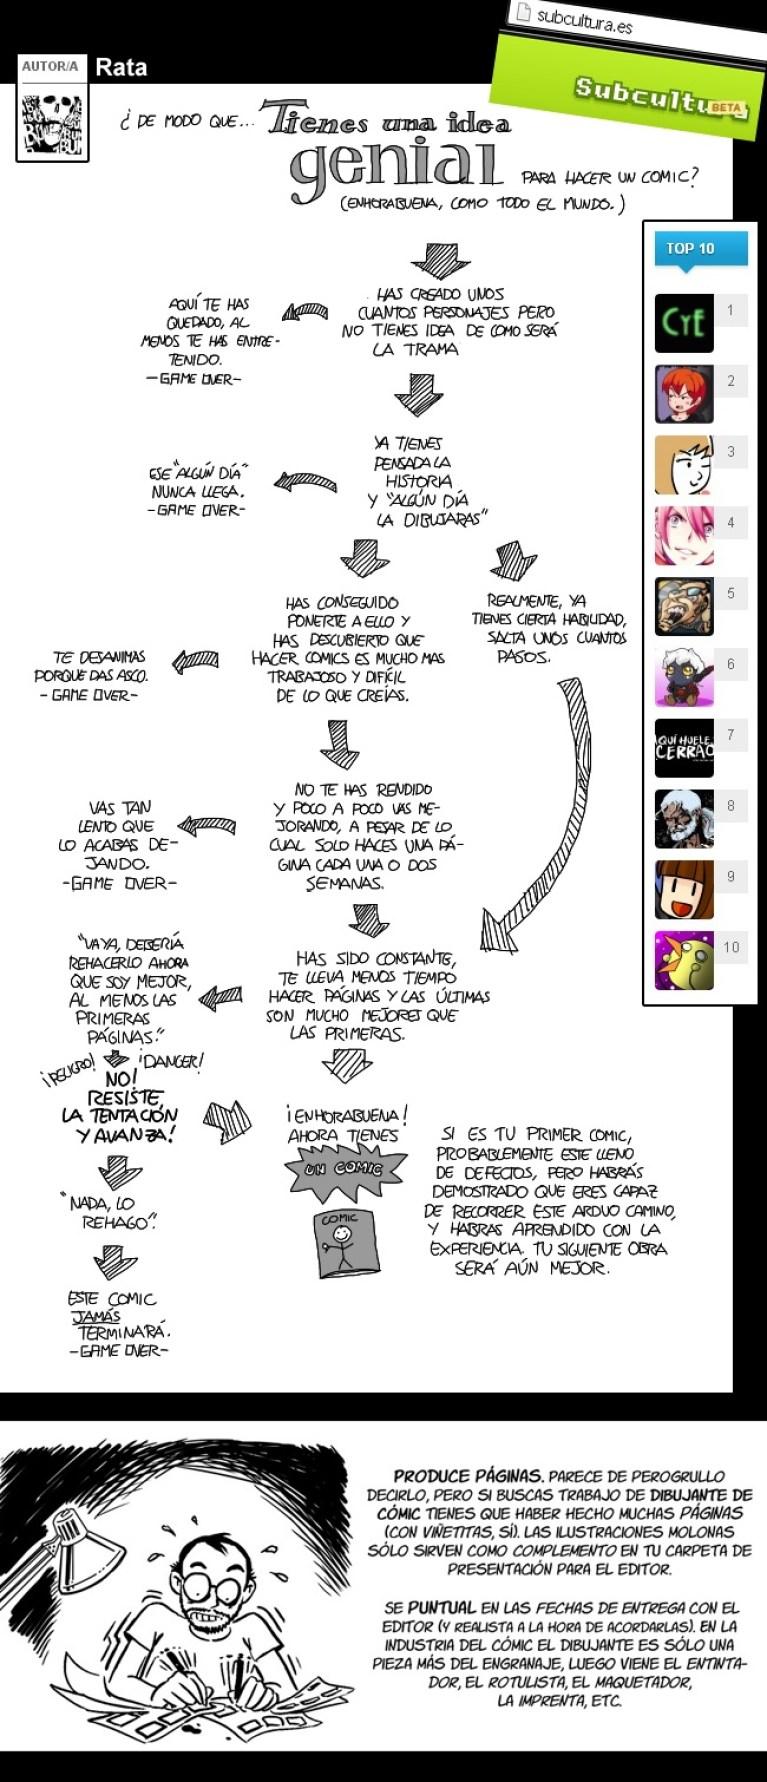 el-arduo-camino-dibujante-comics-madrid-academiac10-alvaro-muñoz